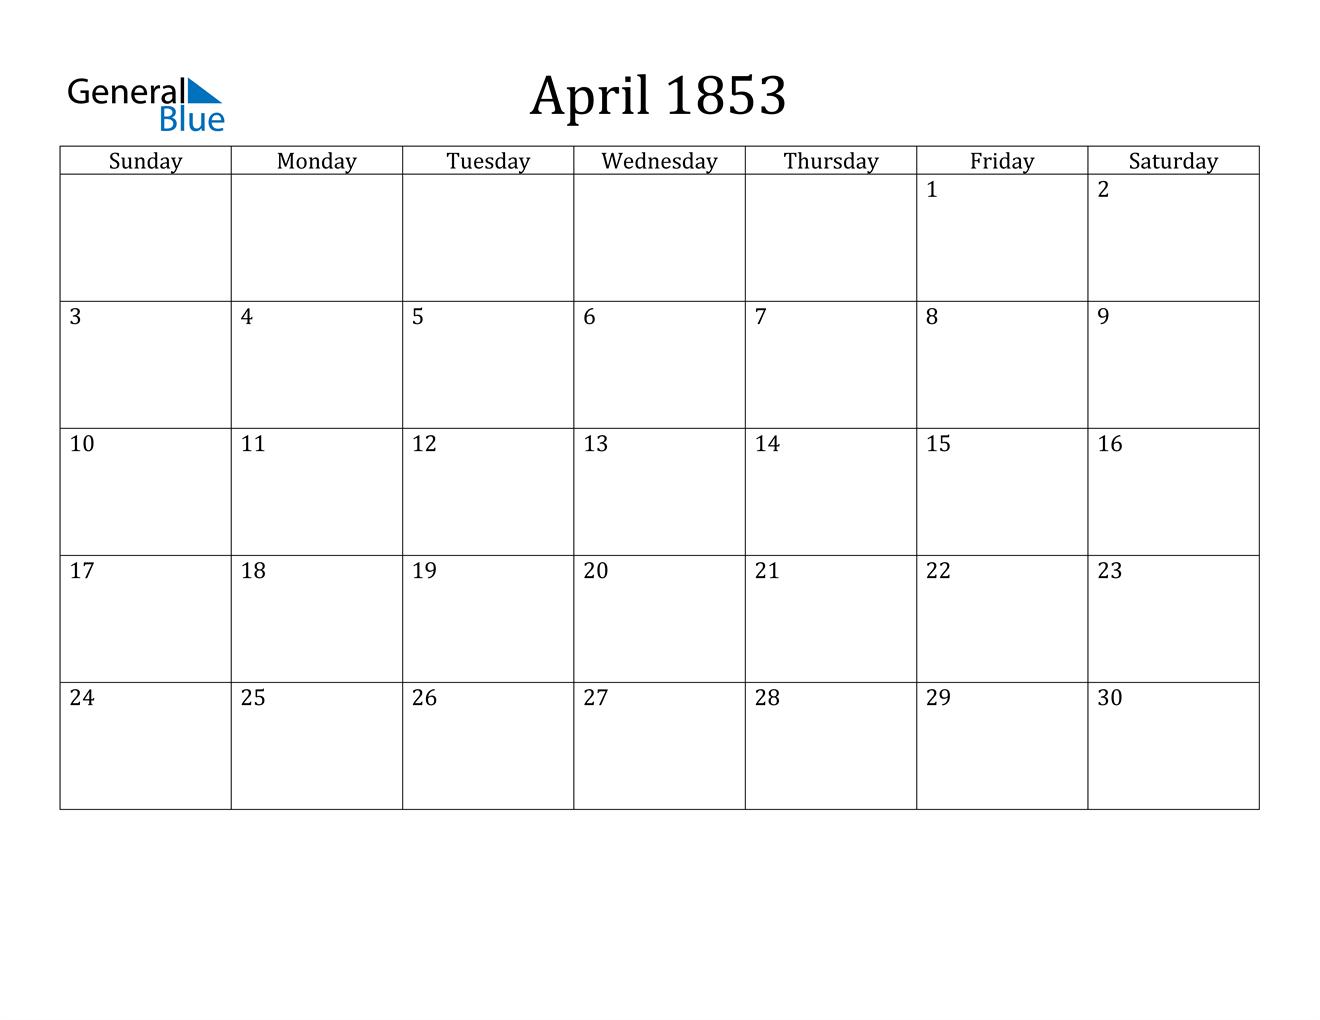 Image of April 1853 Calendar